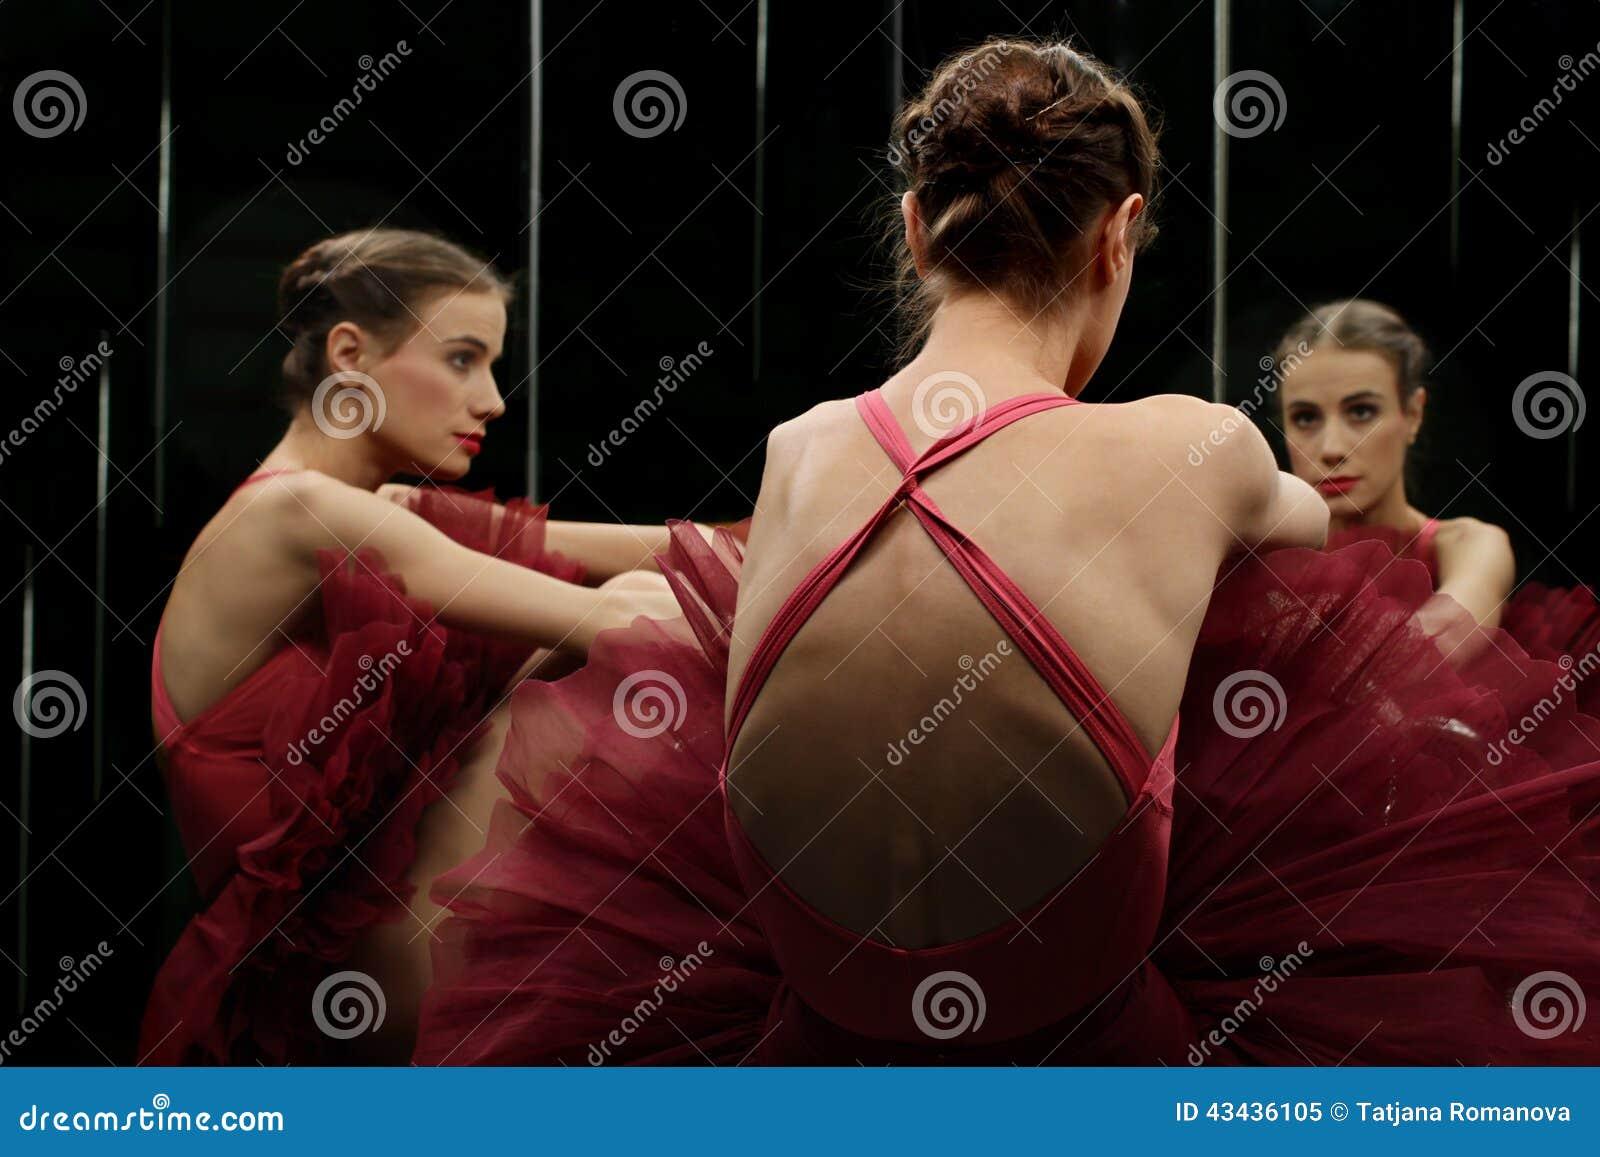 Ballerina dancer looking at the mirror